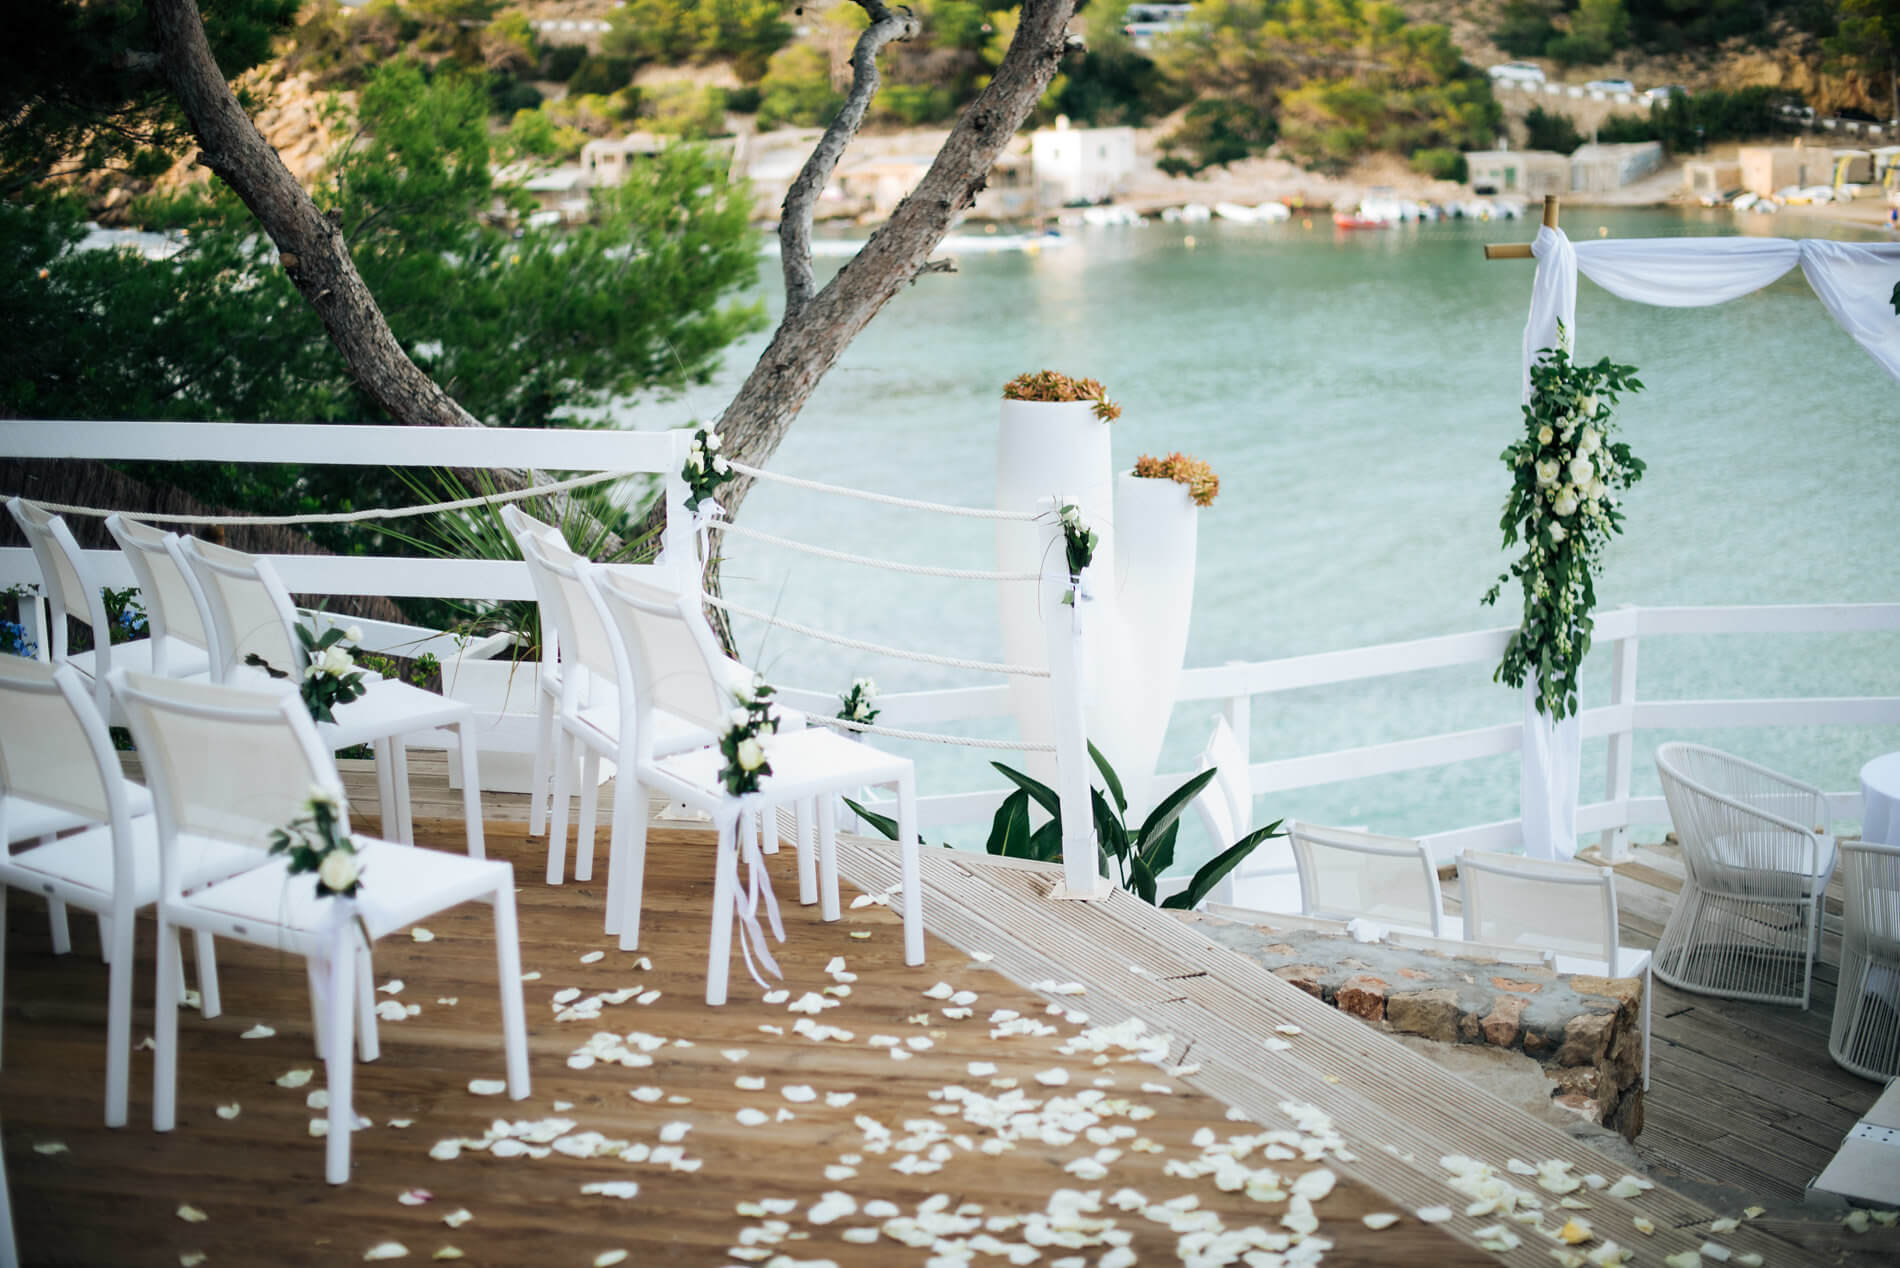 https://www.white-ibiza.com/wp-content/uploads/2020/03/ibiza-wedding-venue-maya-beach-club-2020-12.jpg